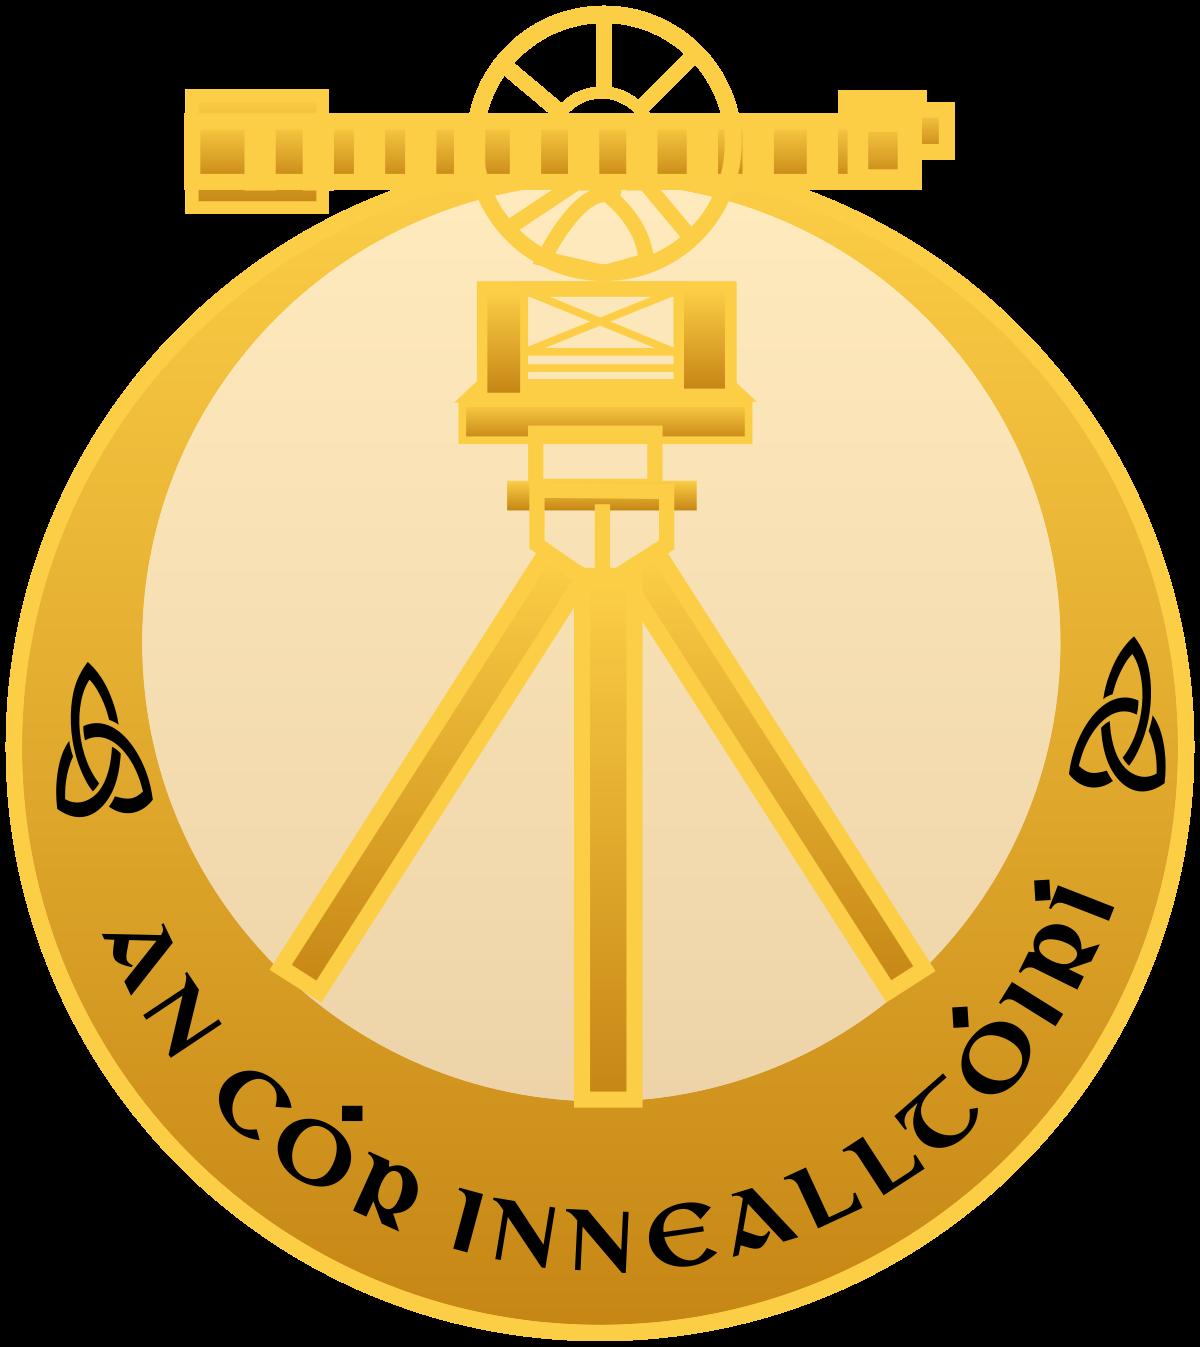 Engineer clipart group engineer. Corps of engineers ireland